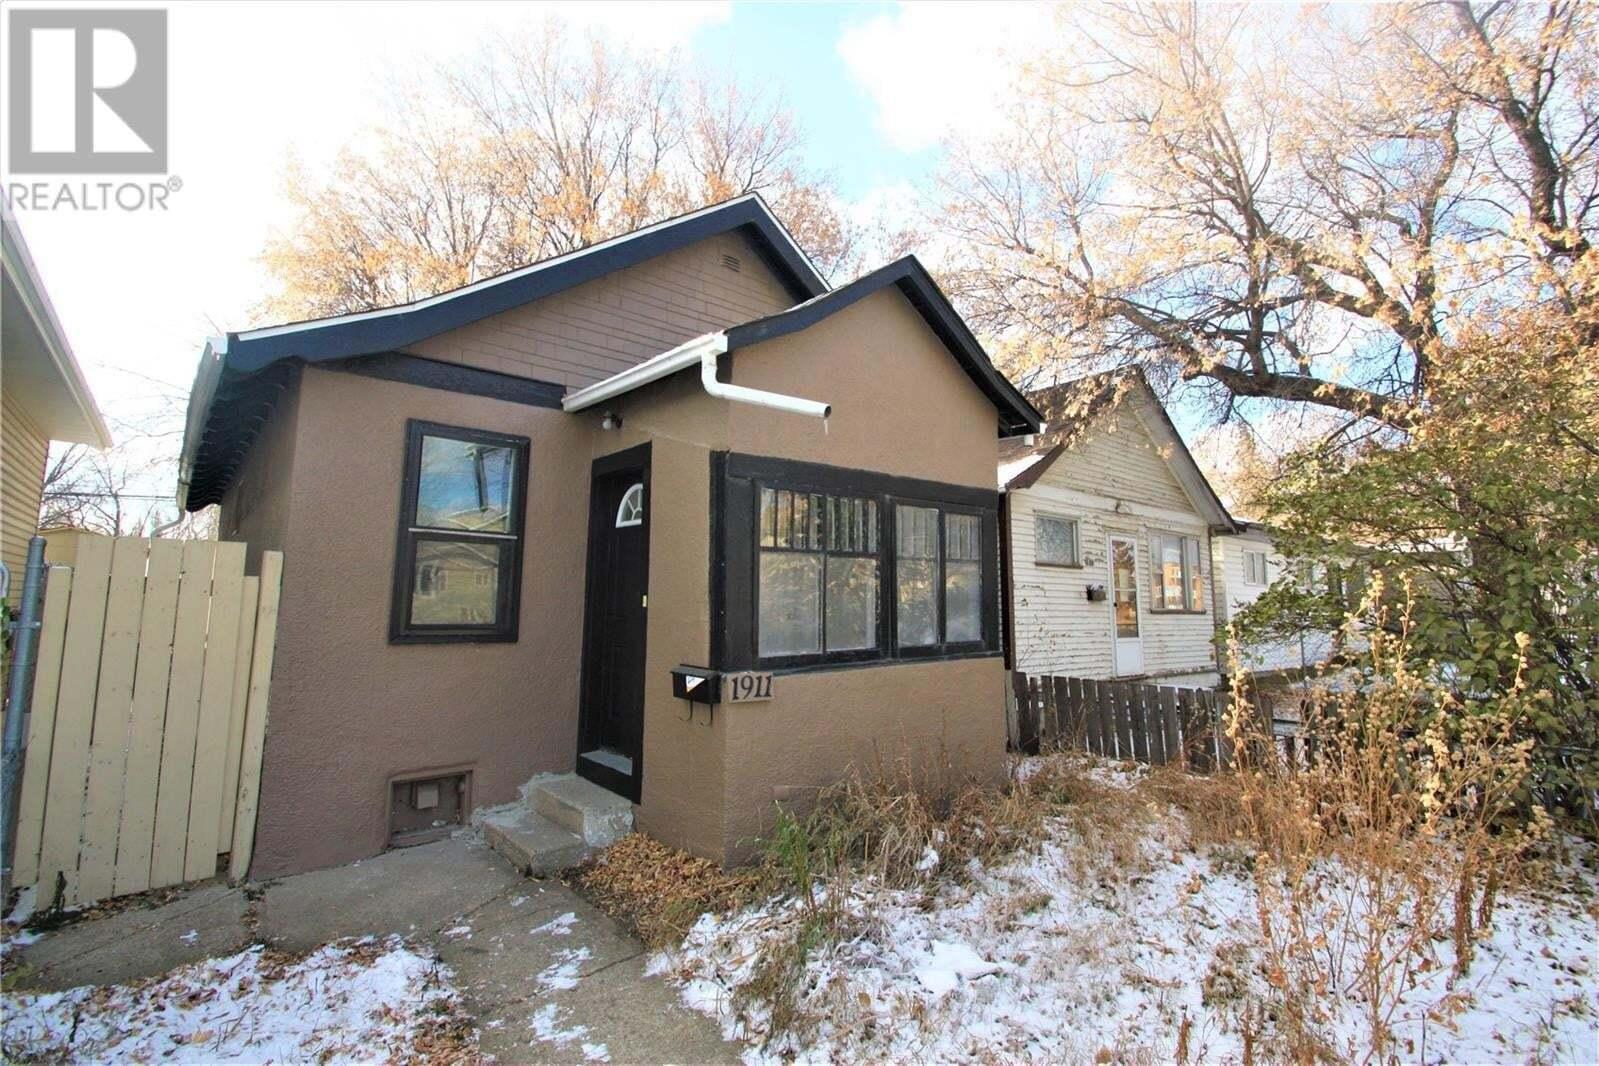 House for sale at 1911 20th St W Saskatoon Saskatchewan - MLS: SK831106